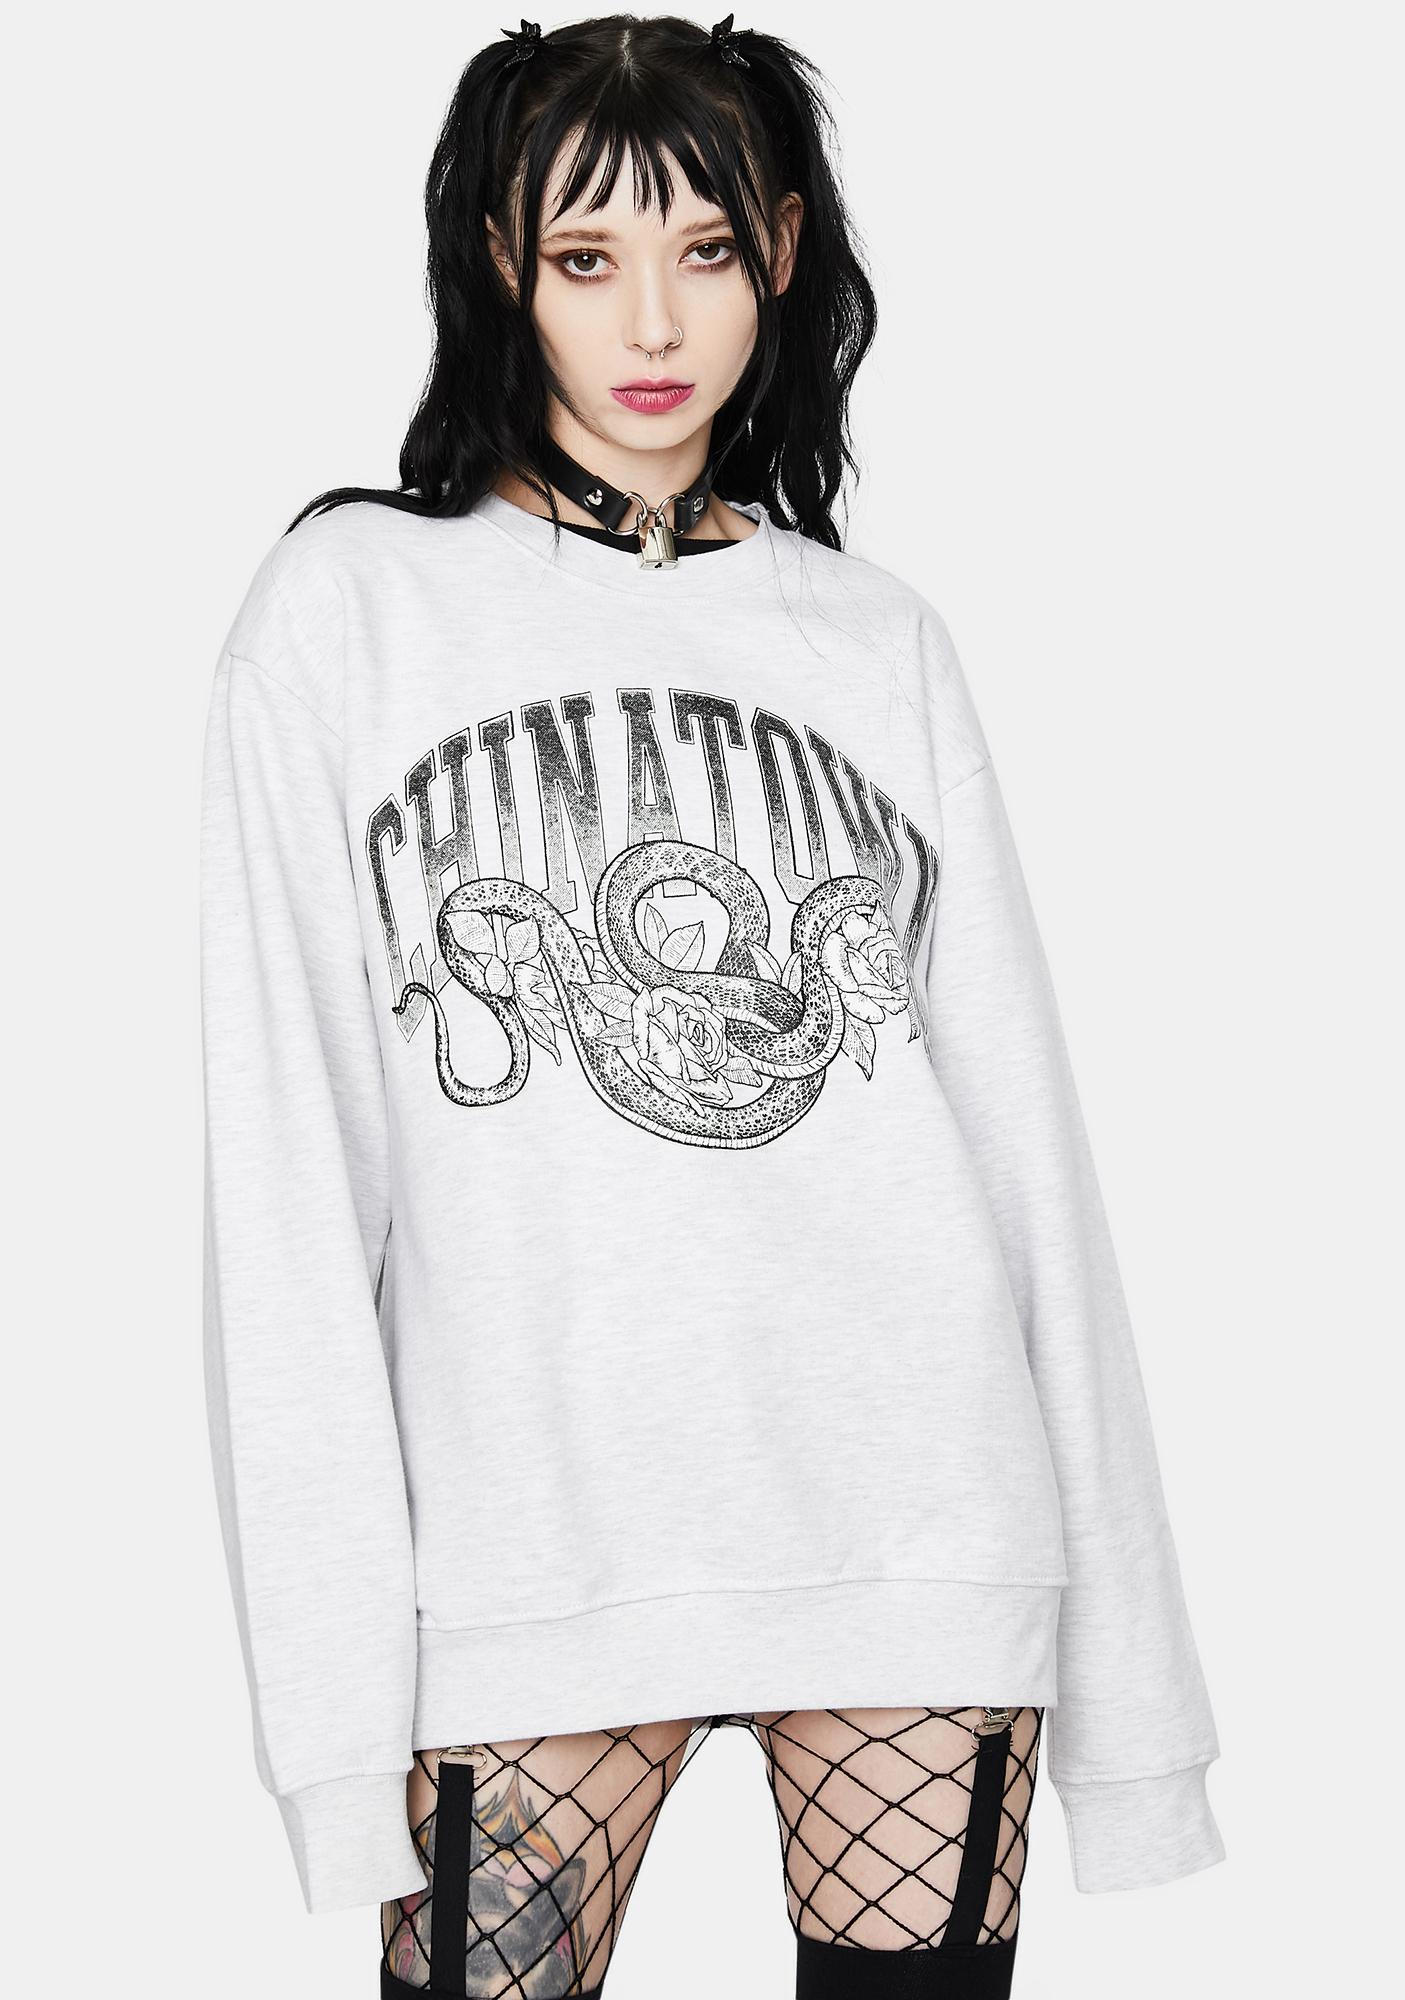 CHINATOWN MARKET Snake Arc Crewneck Sweatshirt